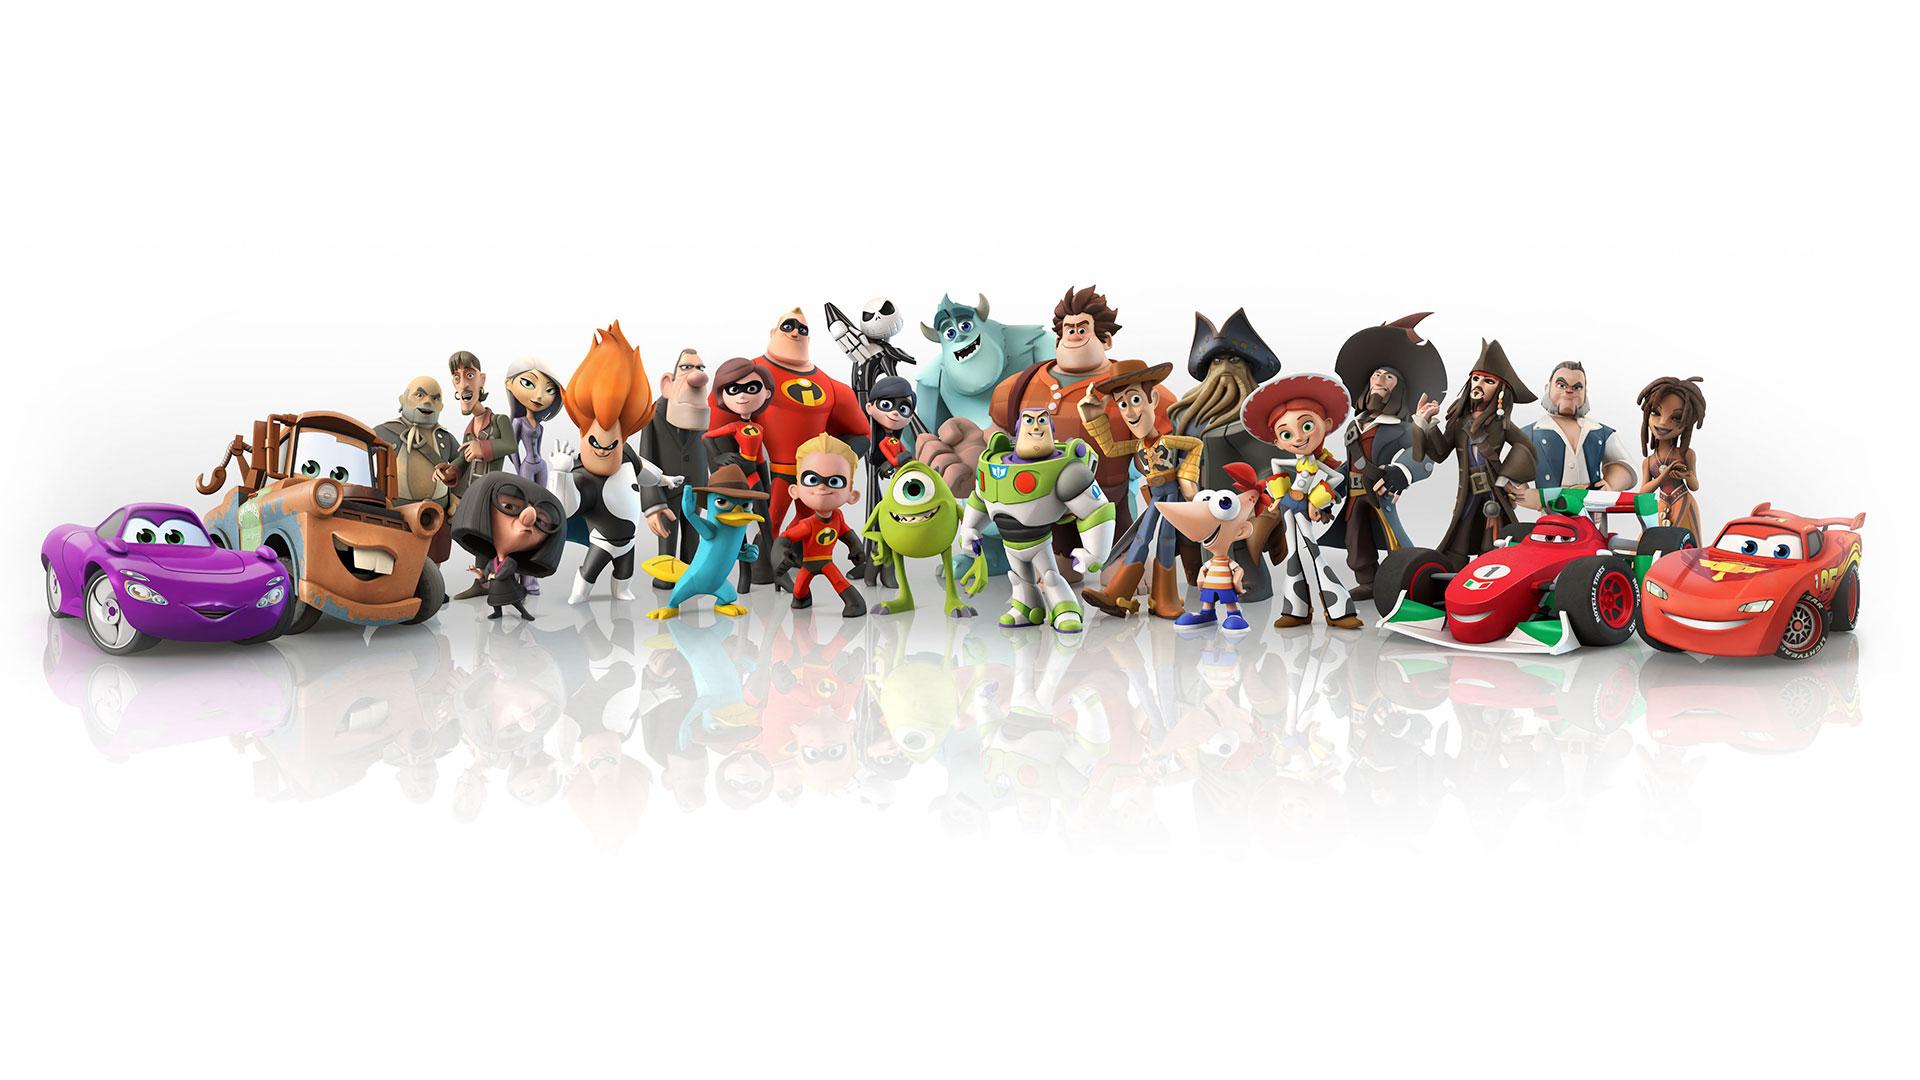 Pixar hero asset